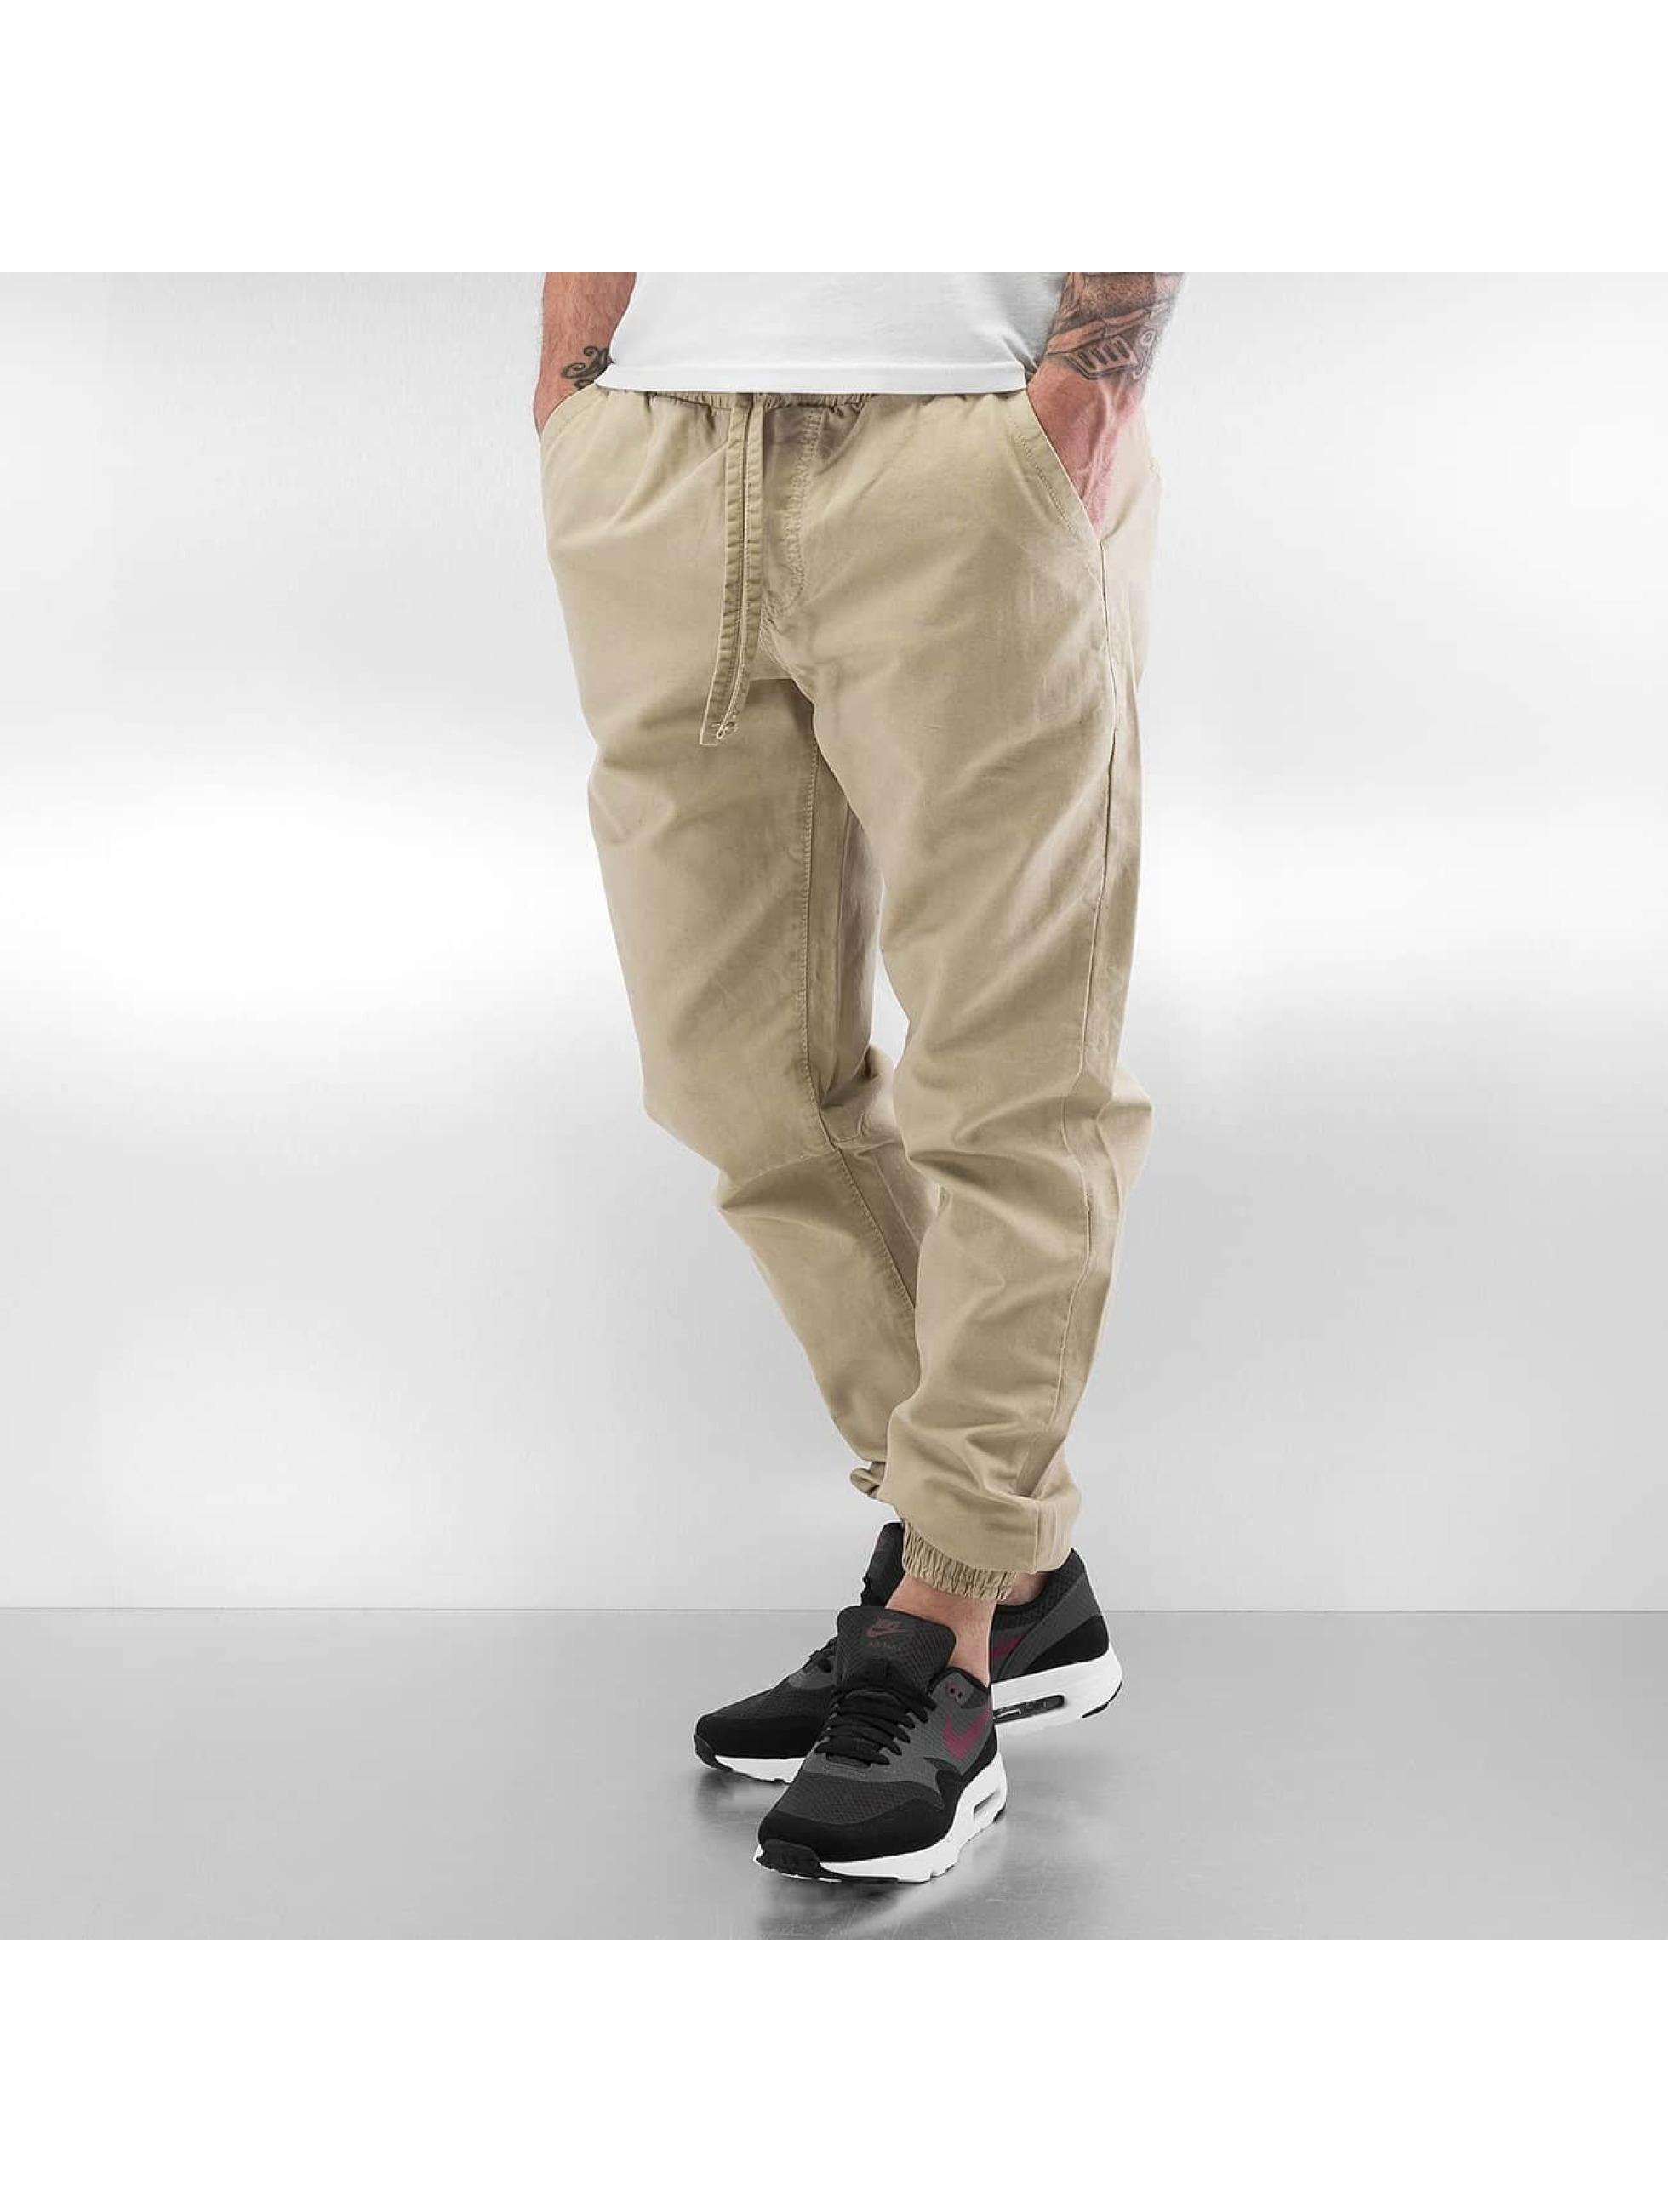 Urban Classics Спортивные брюки Washed Canvas бежевый